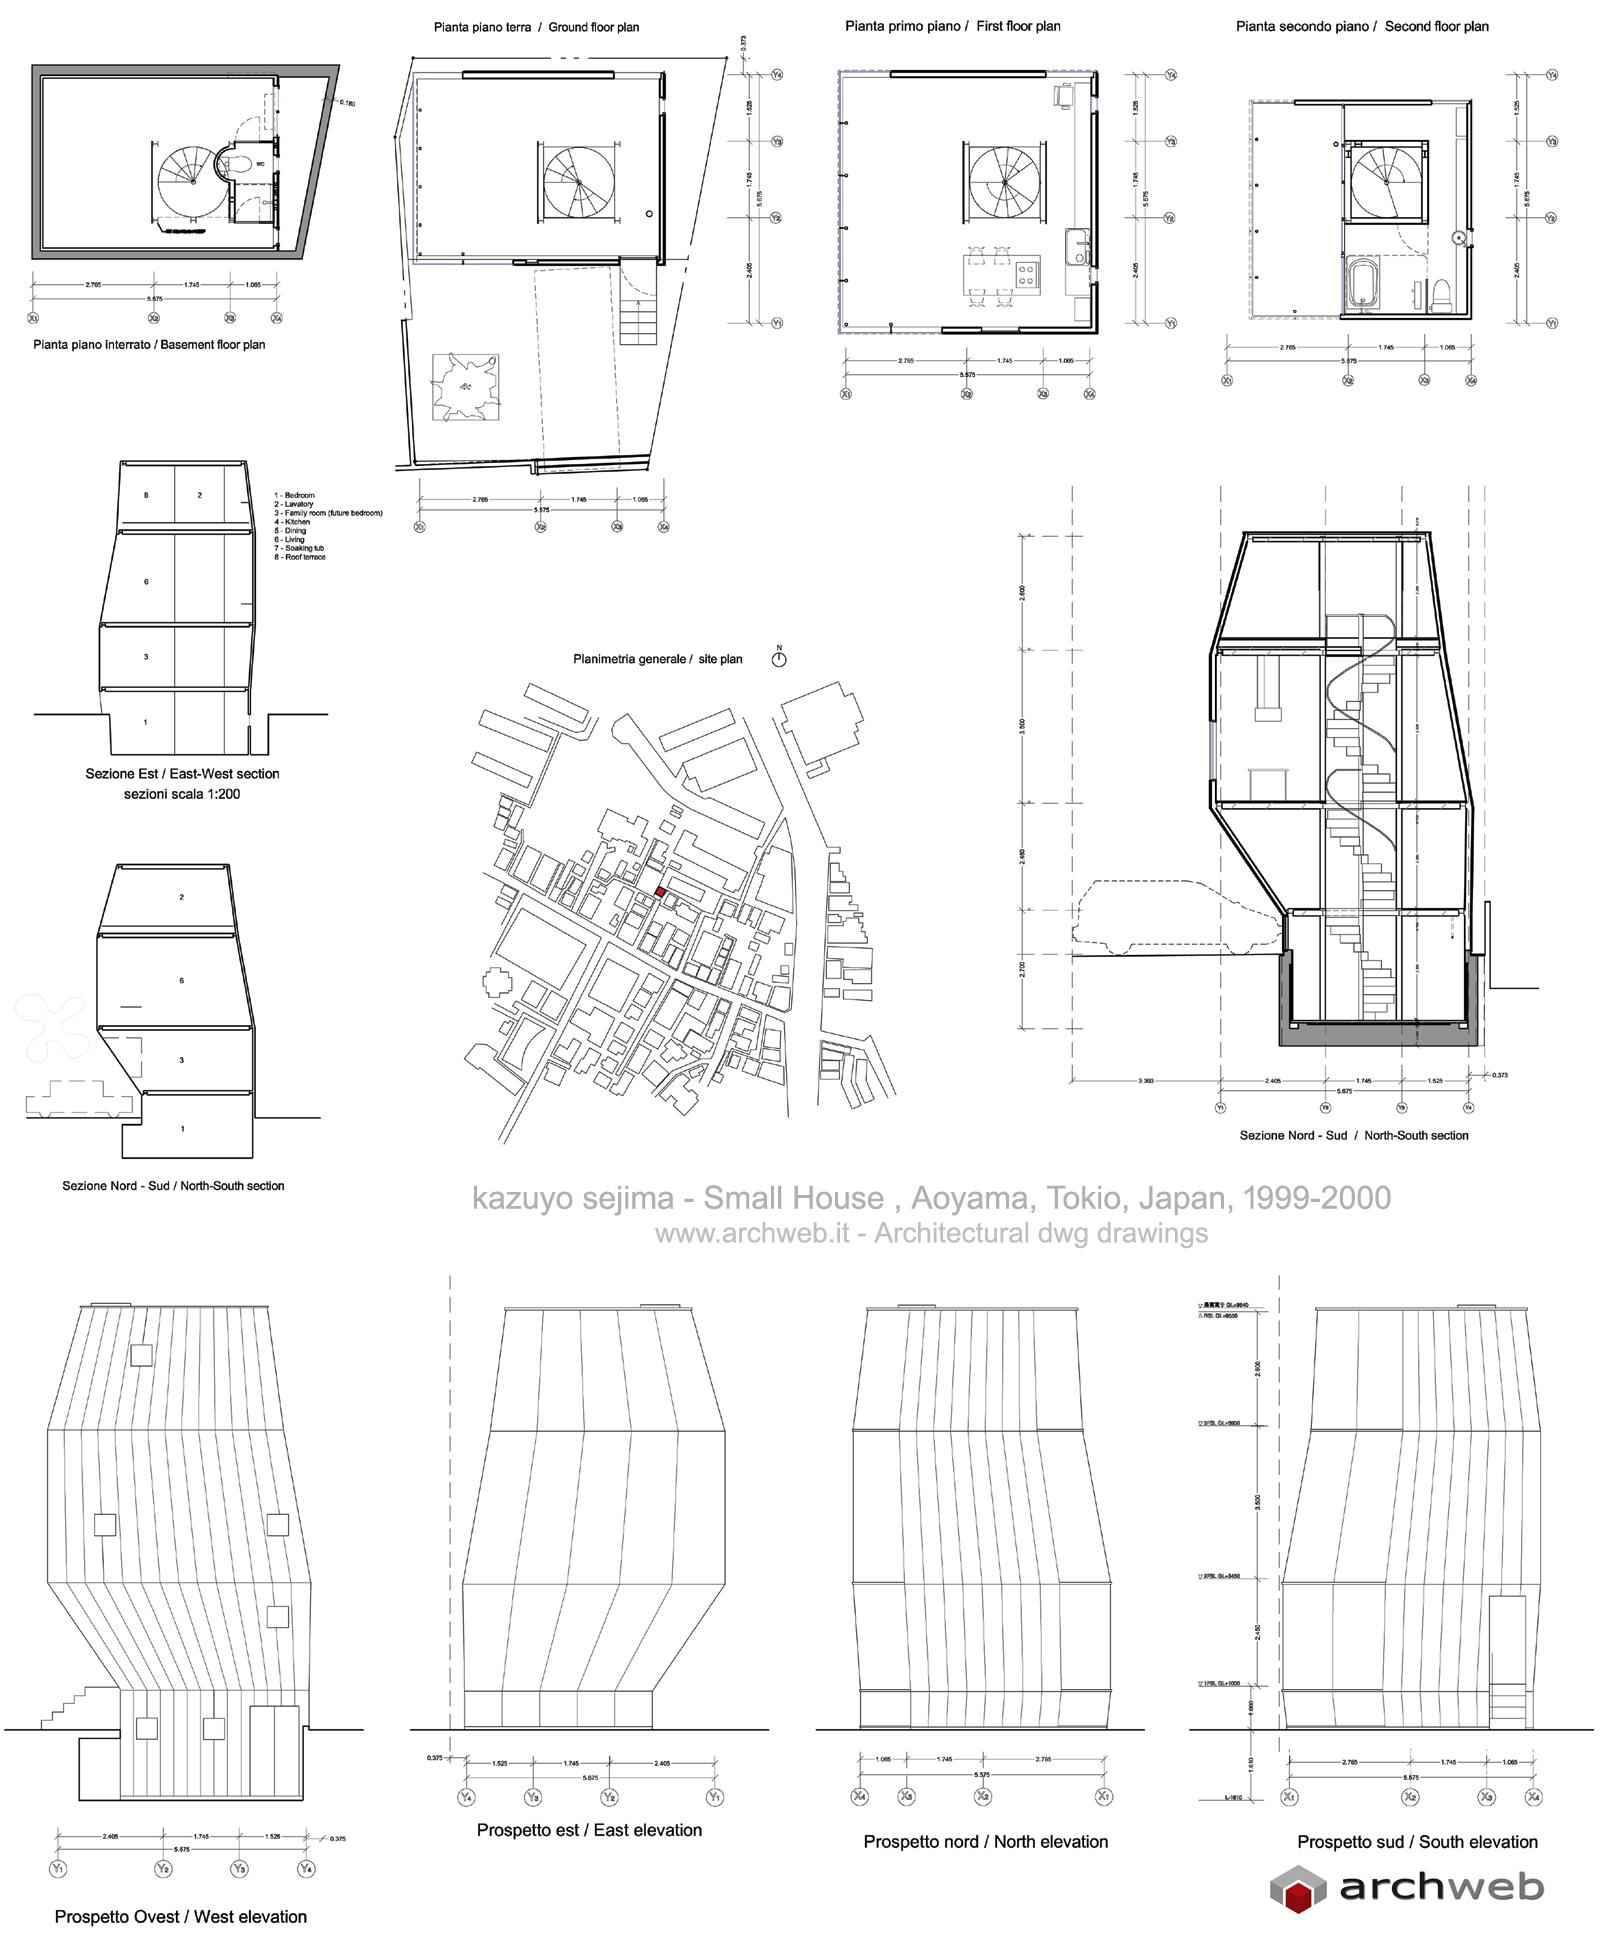 Small House Piccola Casa Kazuyo Sejima